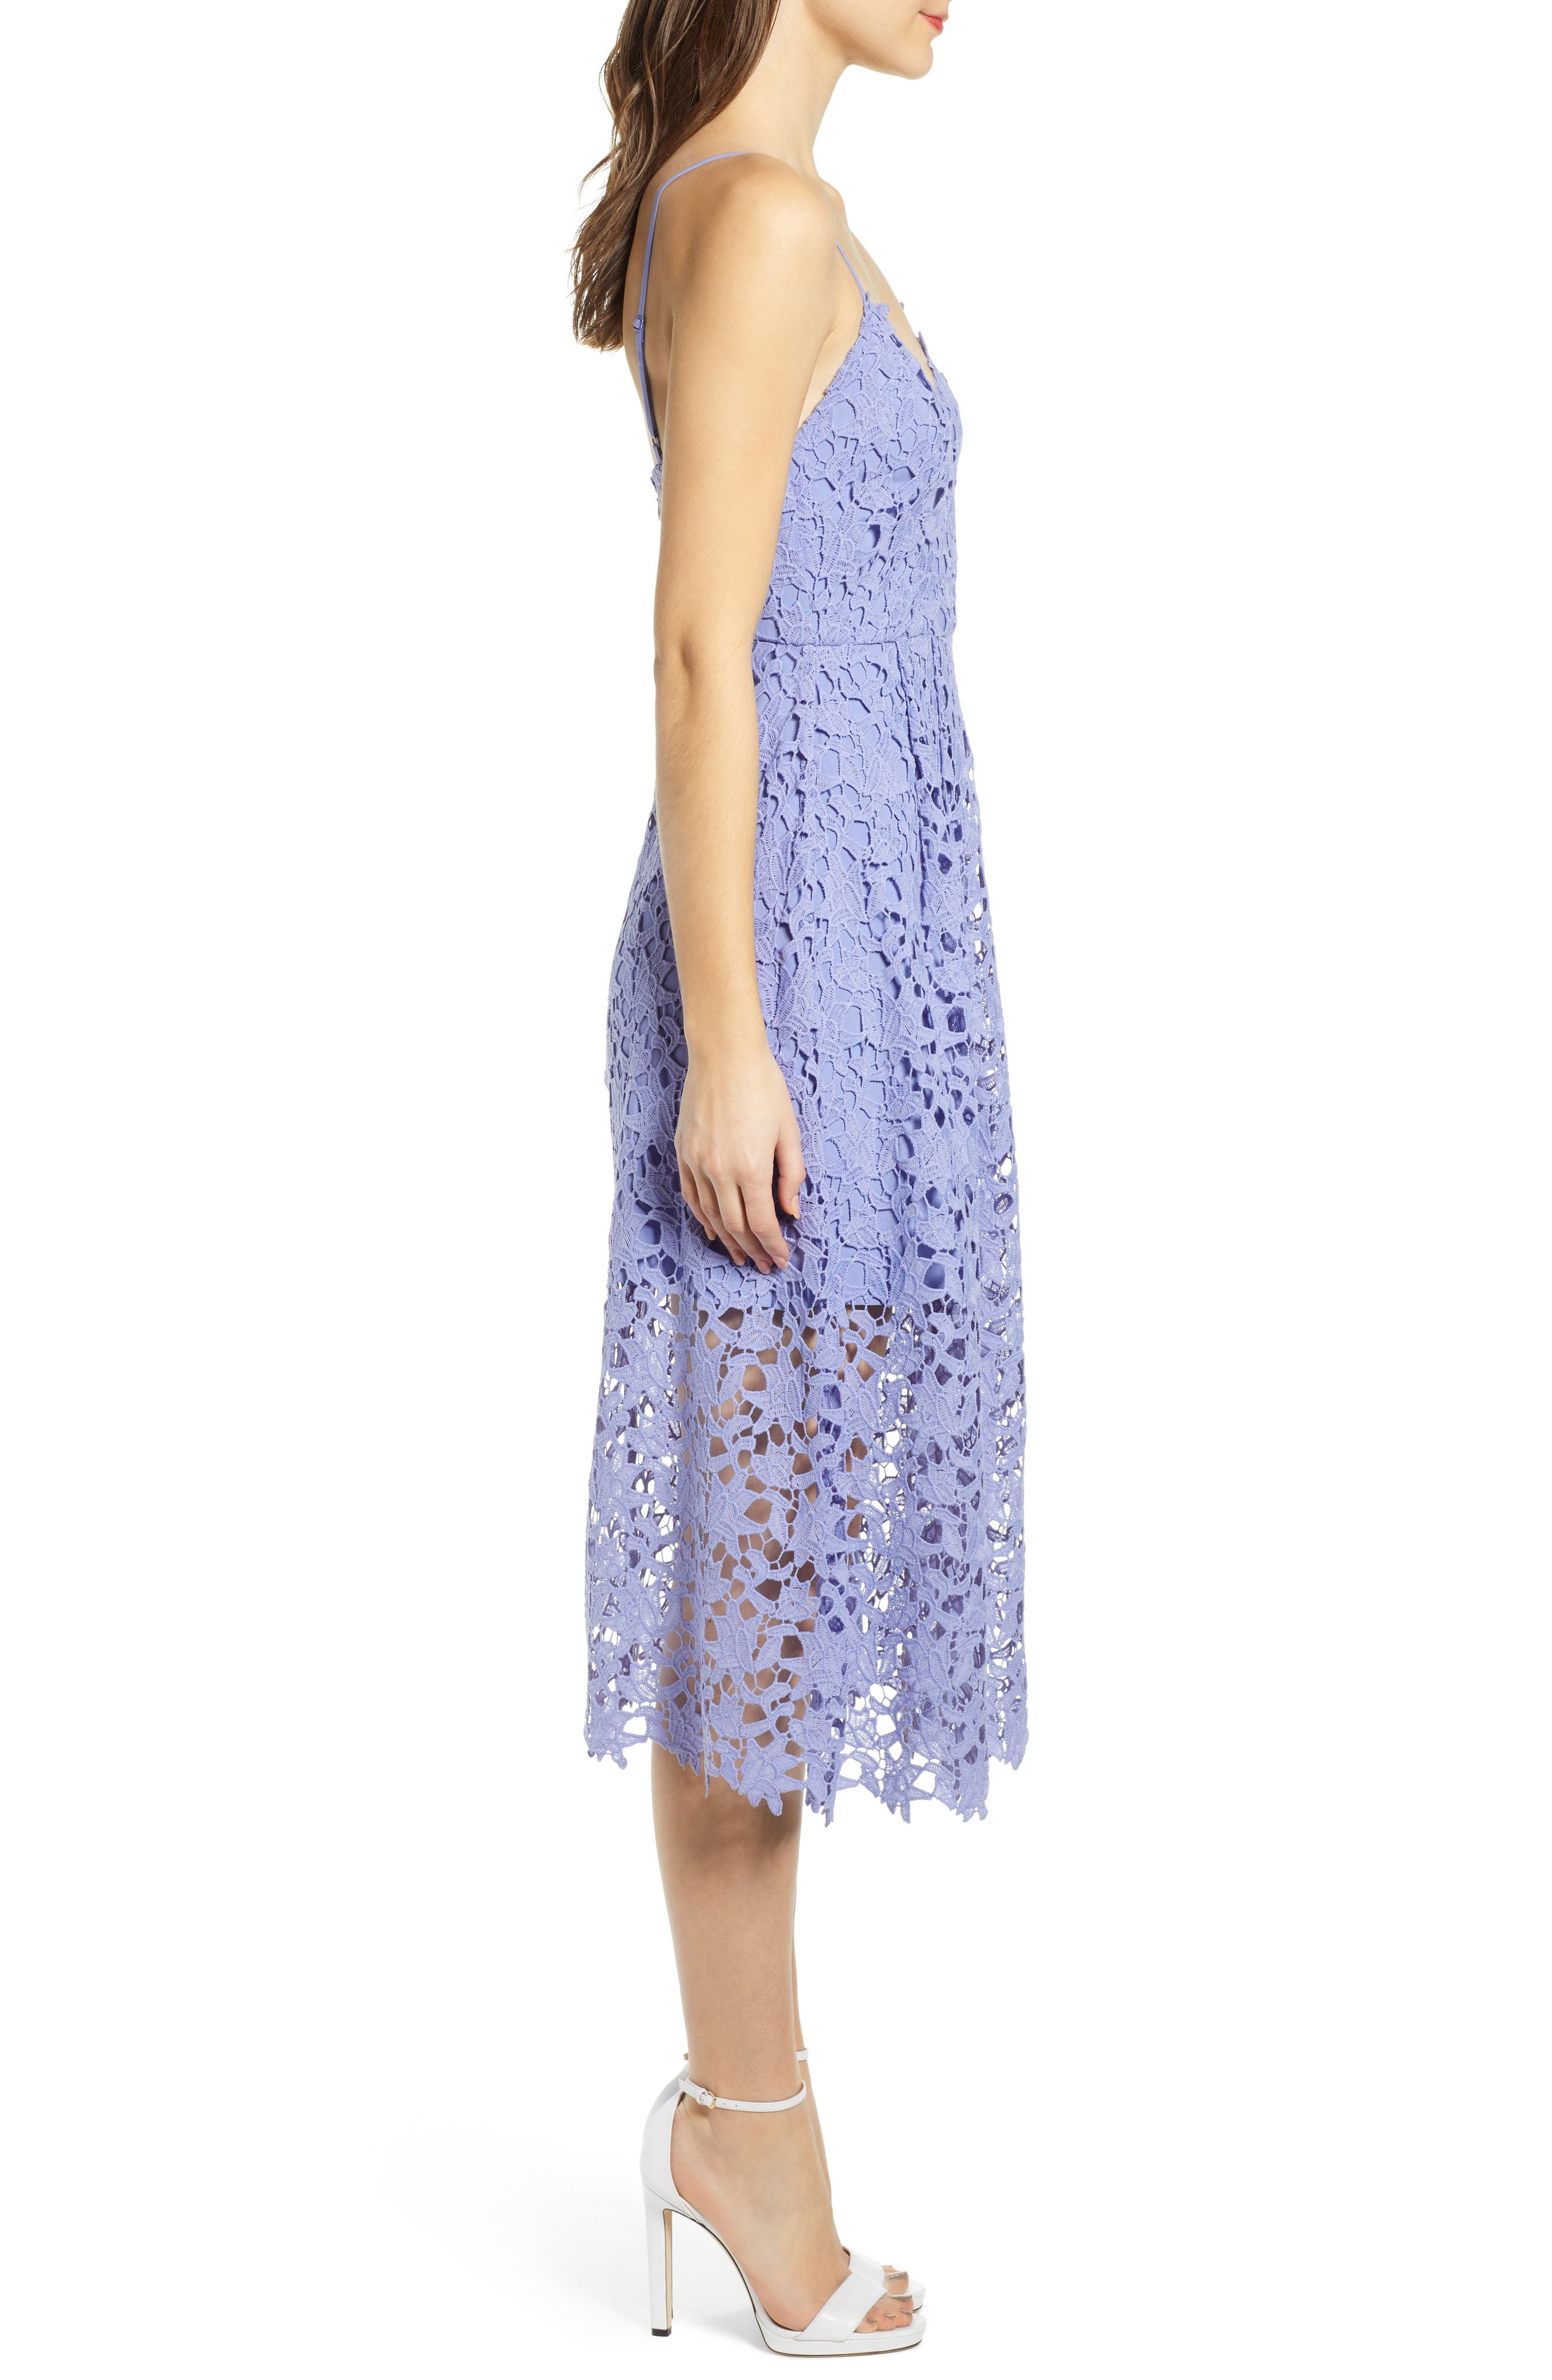 ASTR THE LABEL,                             Lace Midi Dress,                             Alternate thumbnail 3, color,                             LAVENDER